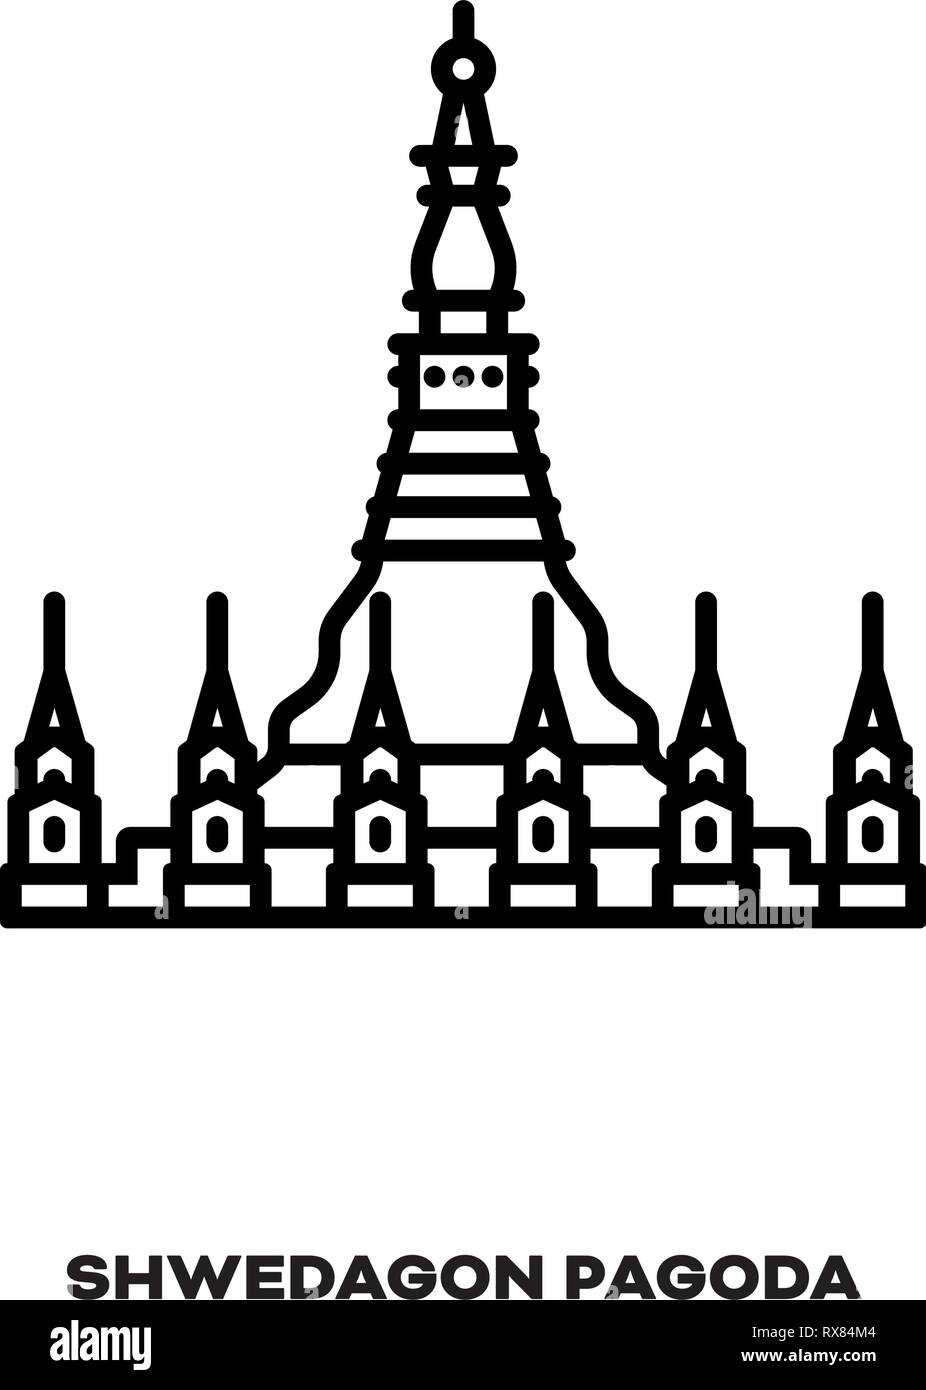 Shwedagon Pagoda at Yangon, Myanmar line icon vector. International landmark and tourism symbol. - Stock Vector